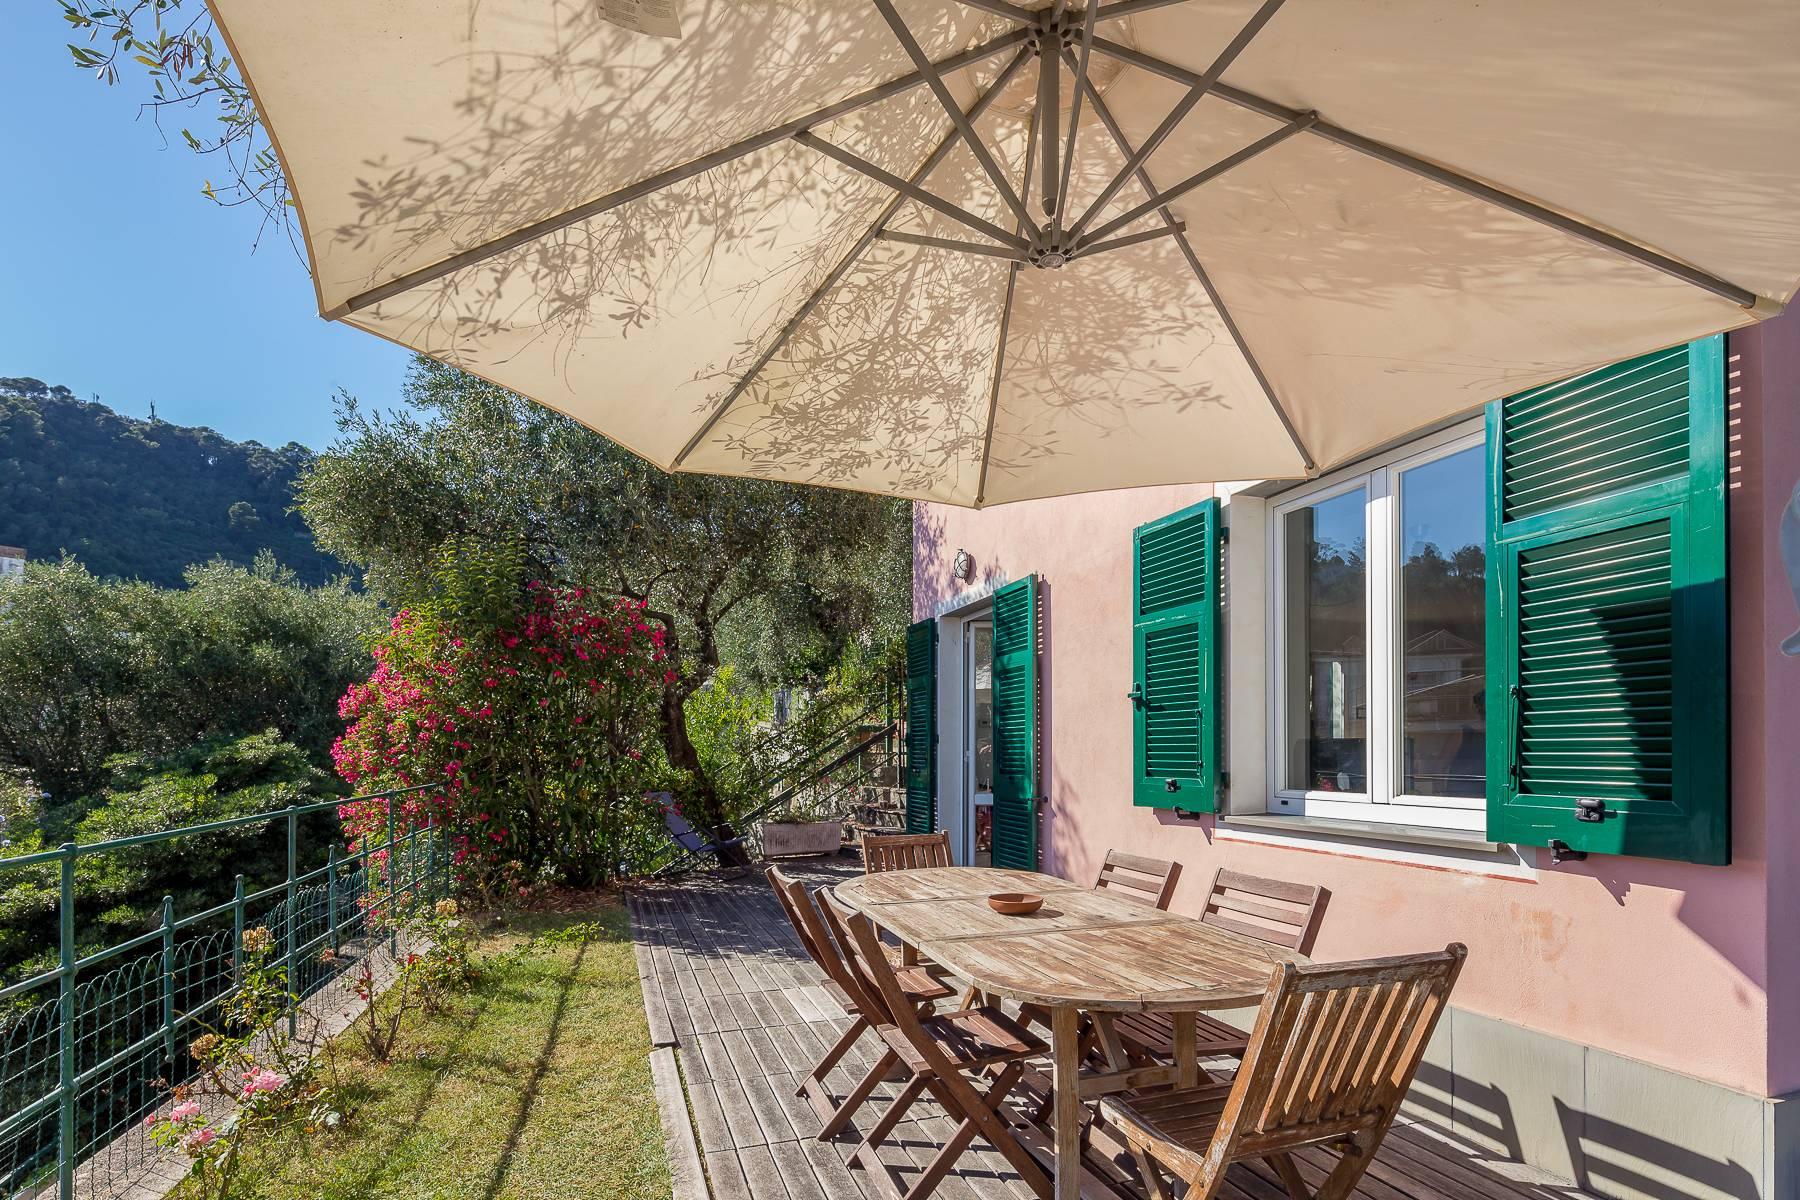 Casa indipendente in Vendita a Zoagli: 5 locali, 100 mq - Foto 2